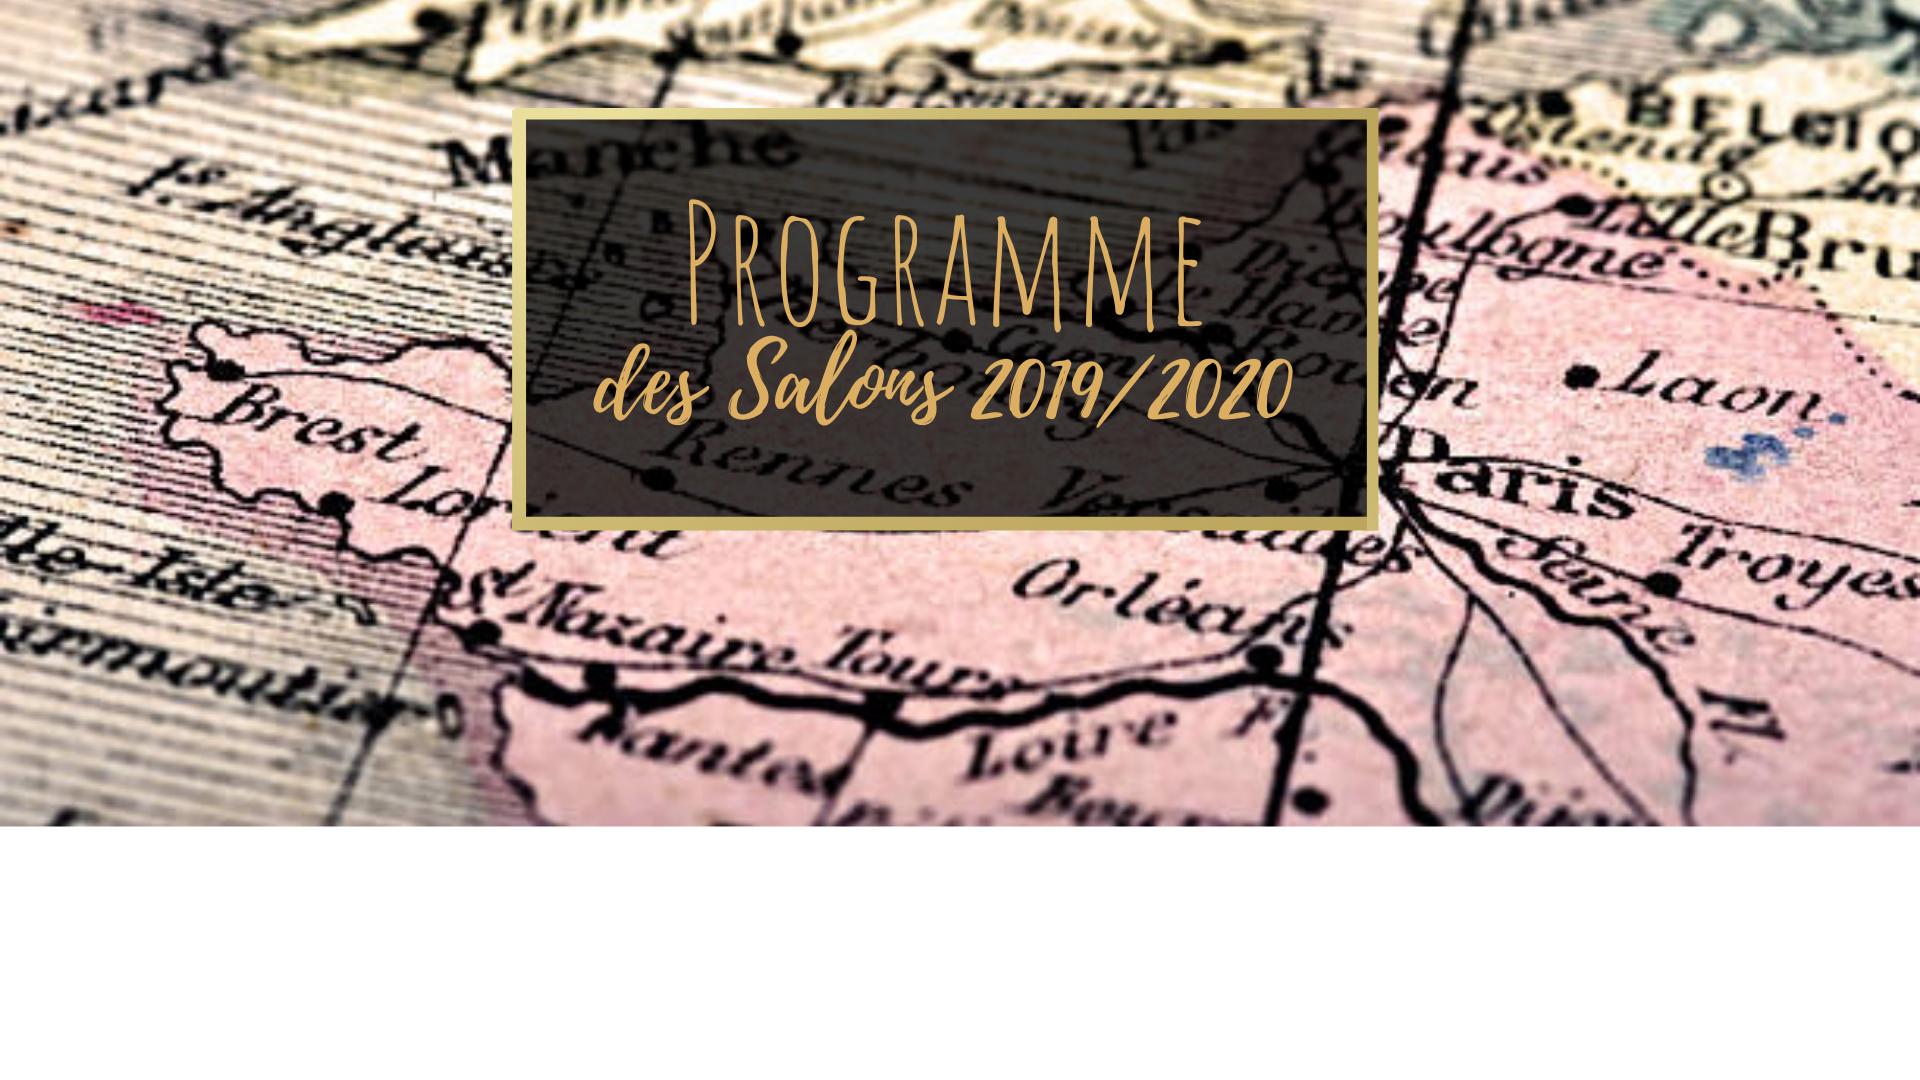 Programme de nos Salons 2019/2020